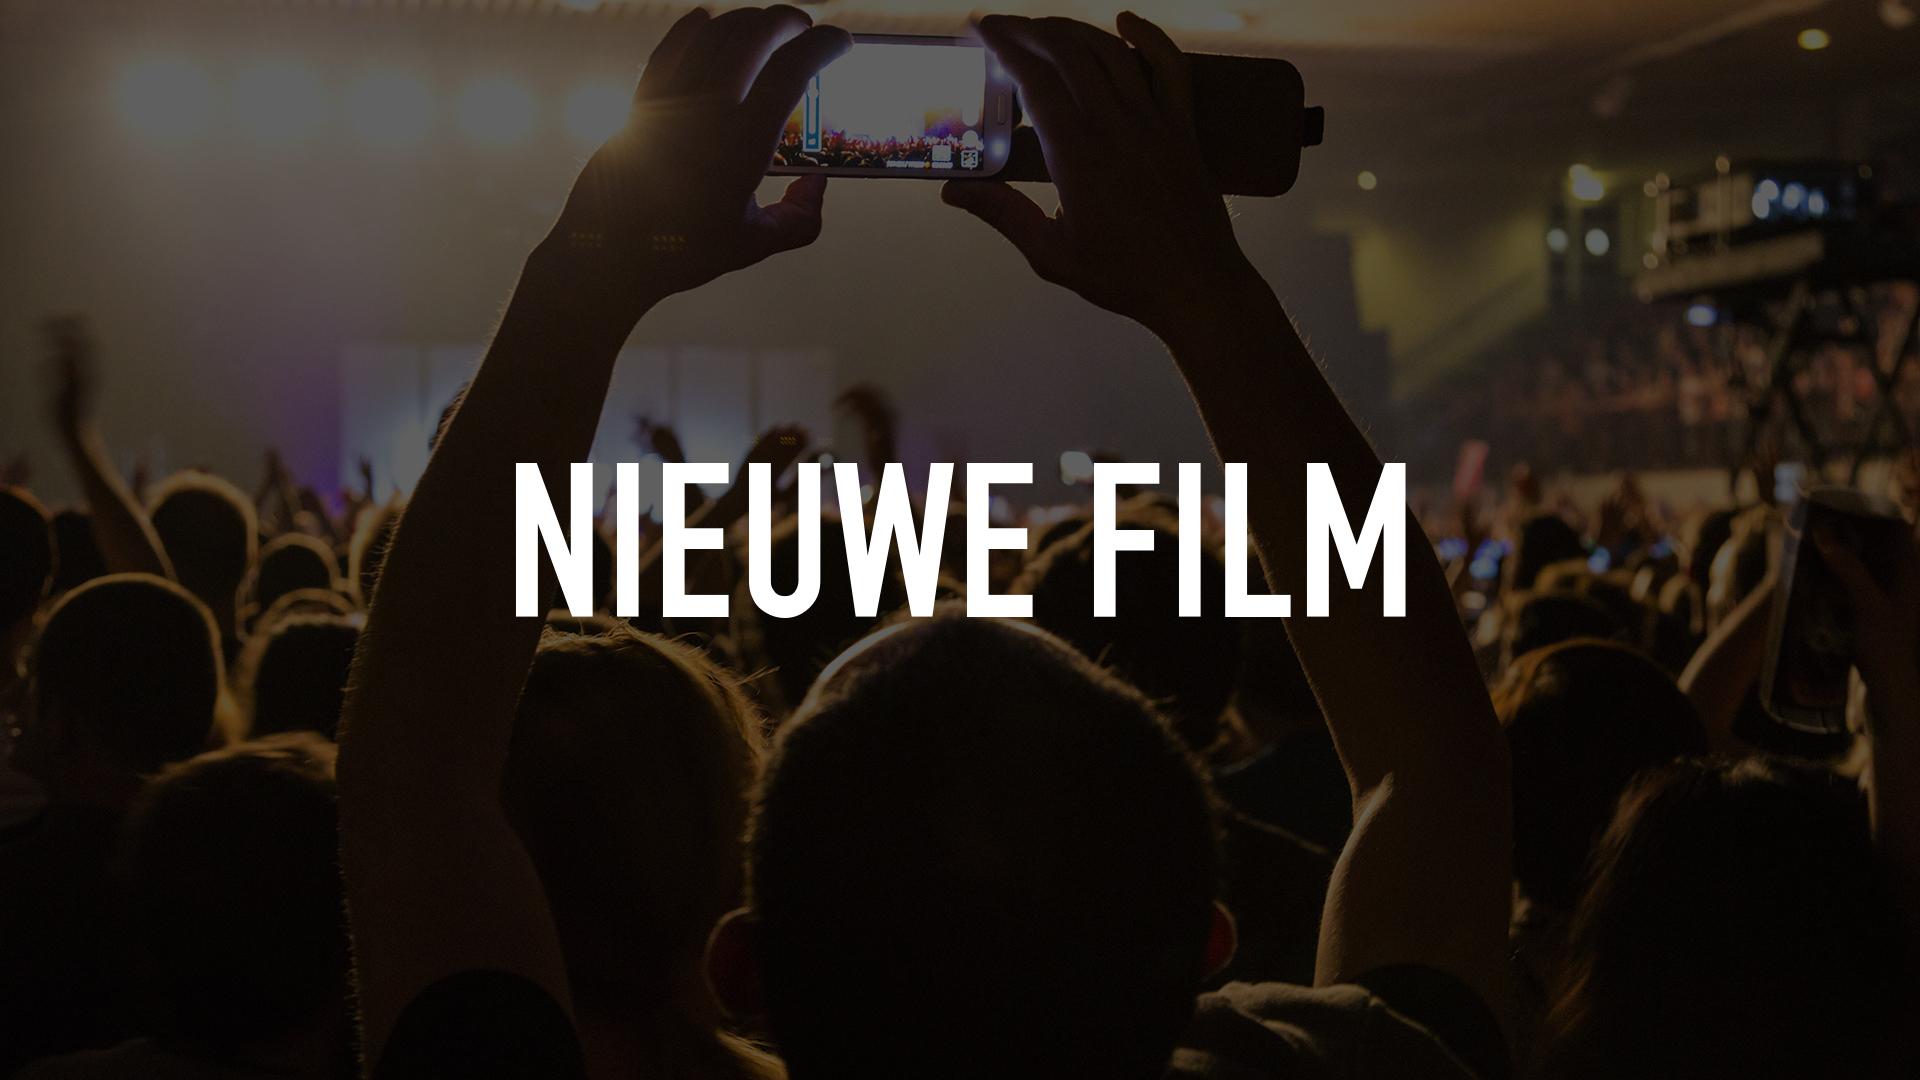 Nieuwe film